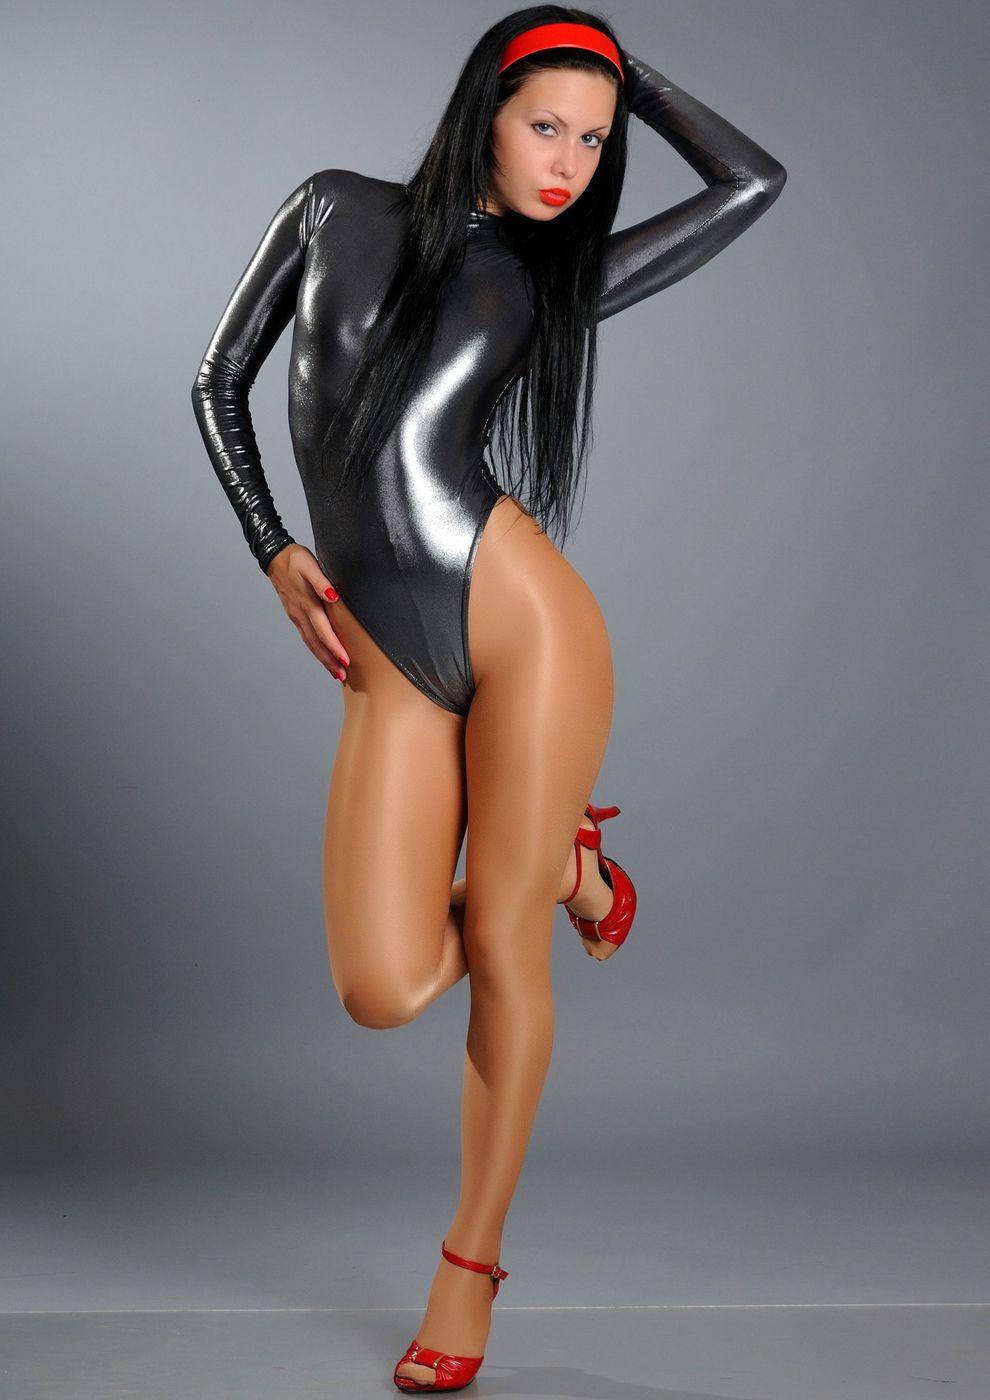 Nude bondage pics